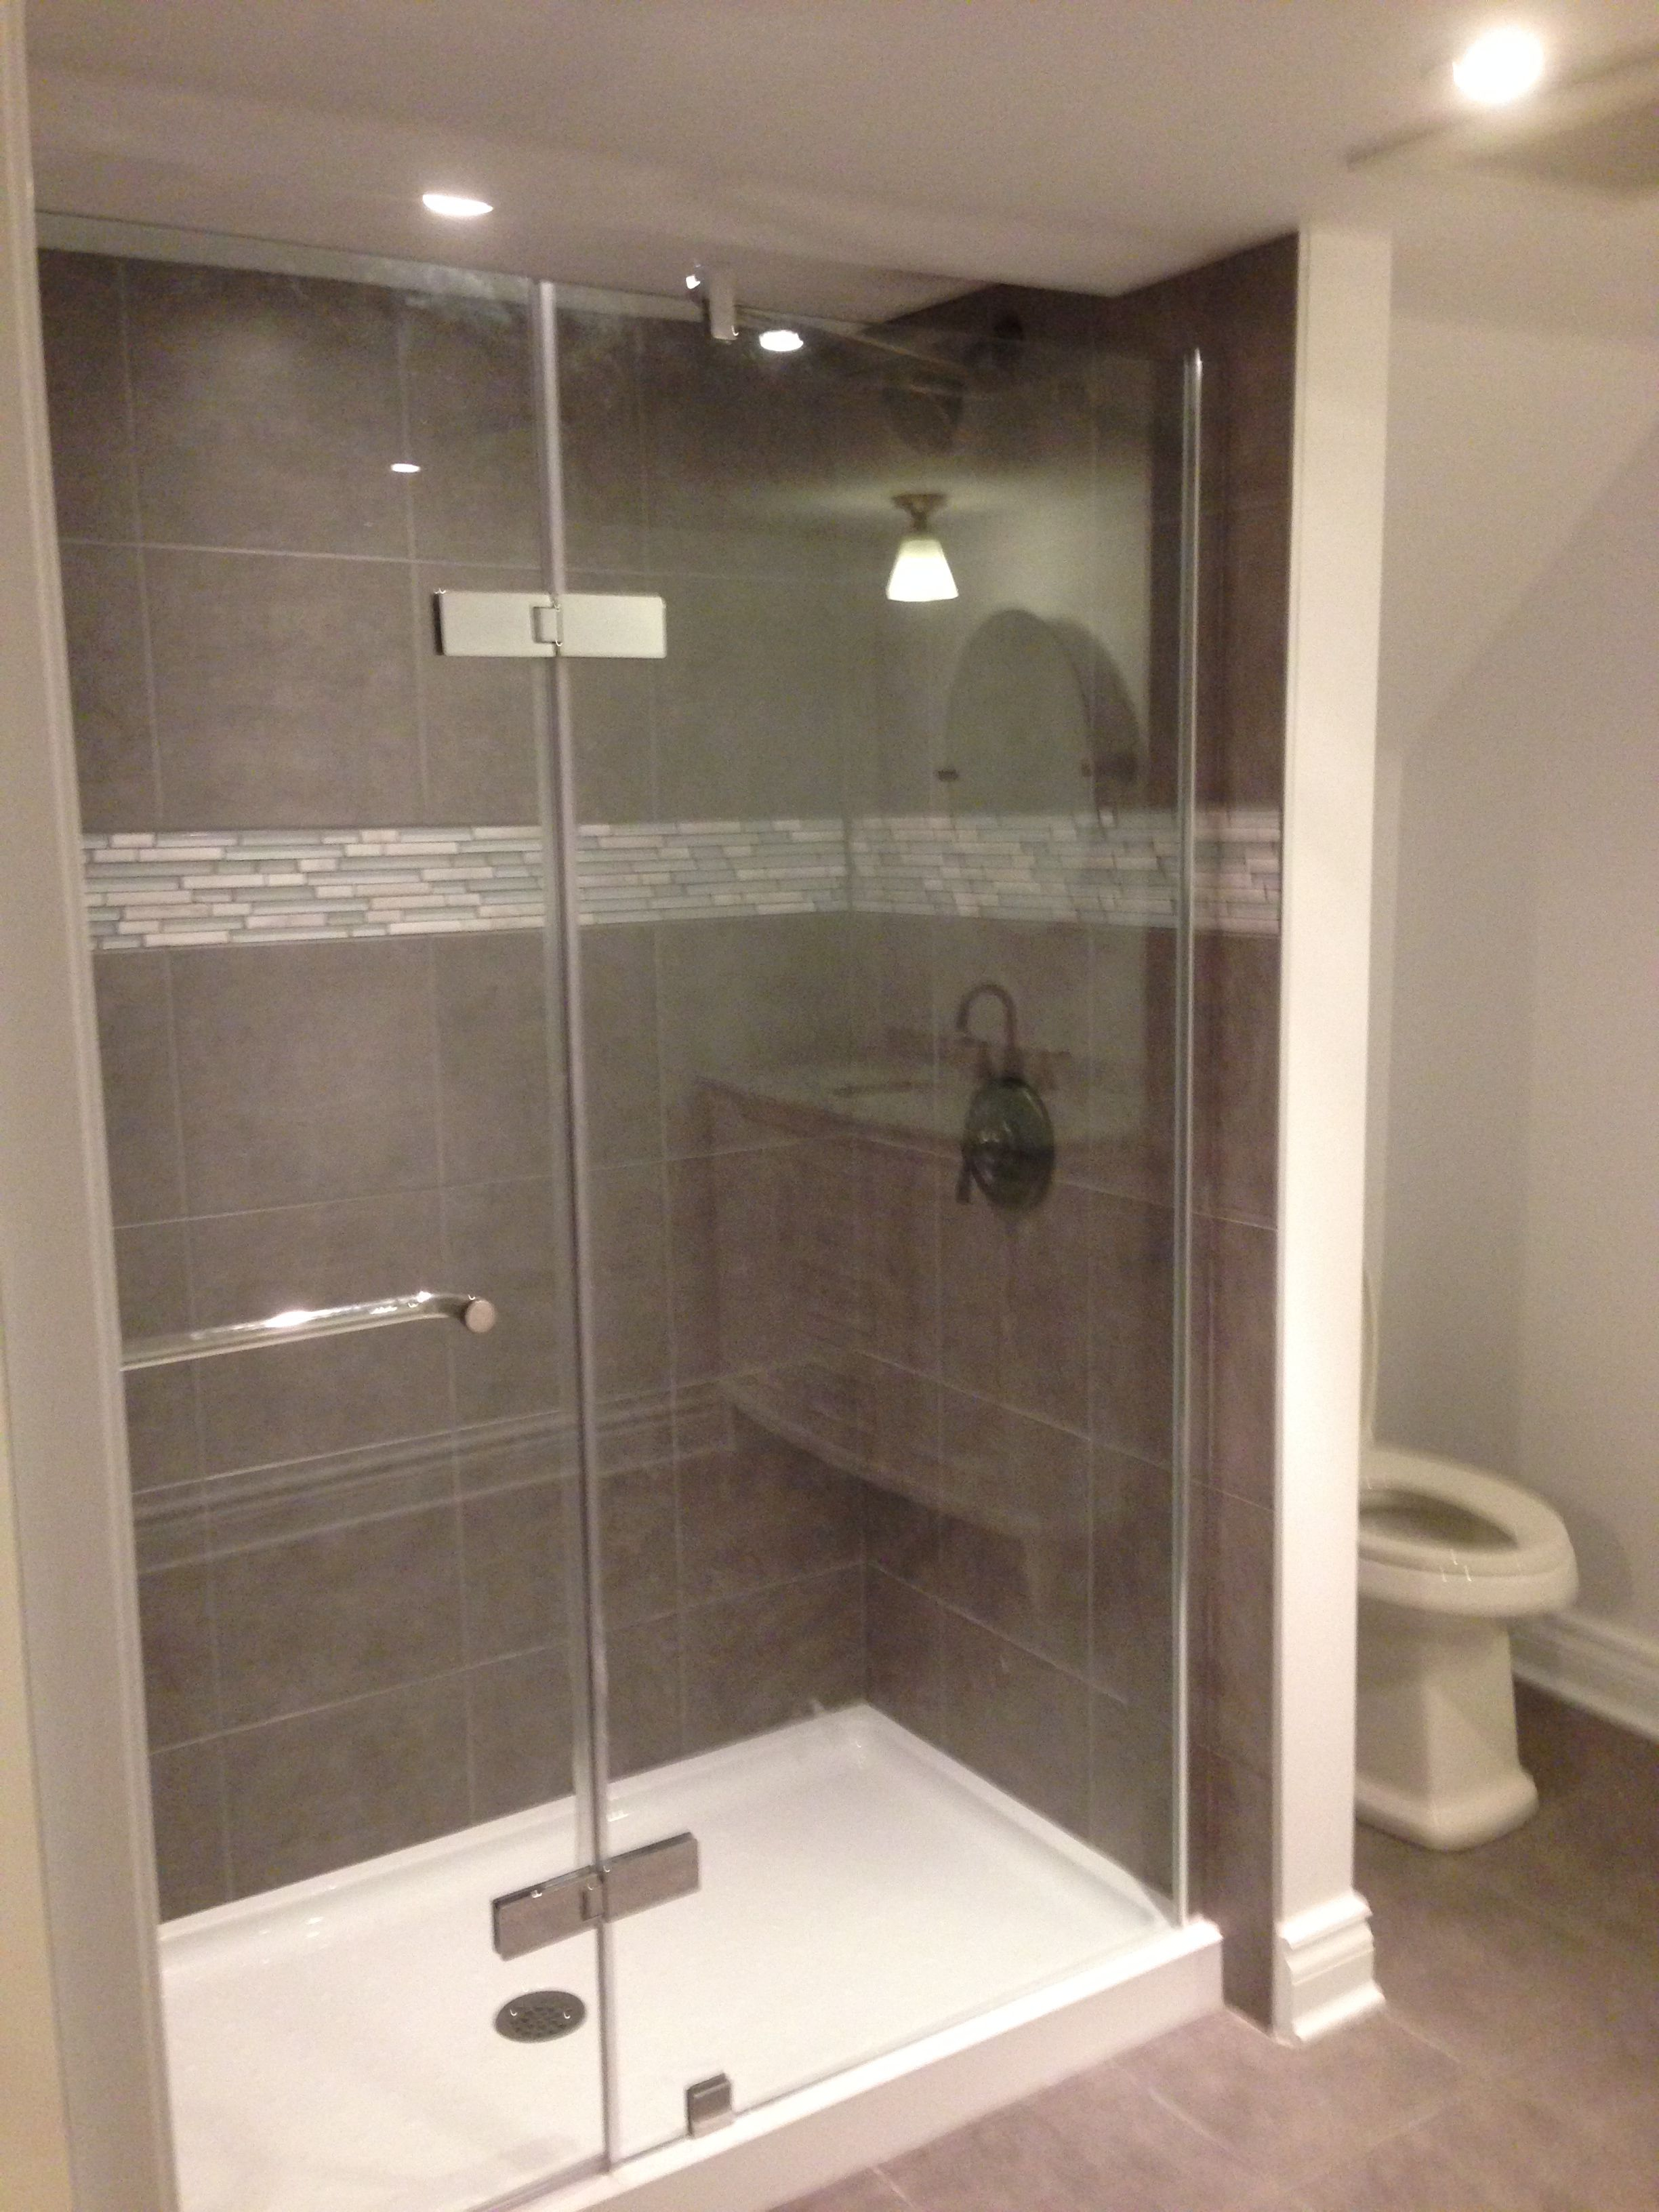 douche vitr e avec murs en c ramique shower with glass panels and ceramic tiles bathroom. Black Bedroom Furniture Sets. Home Design Ideas